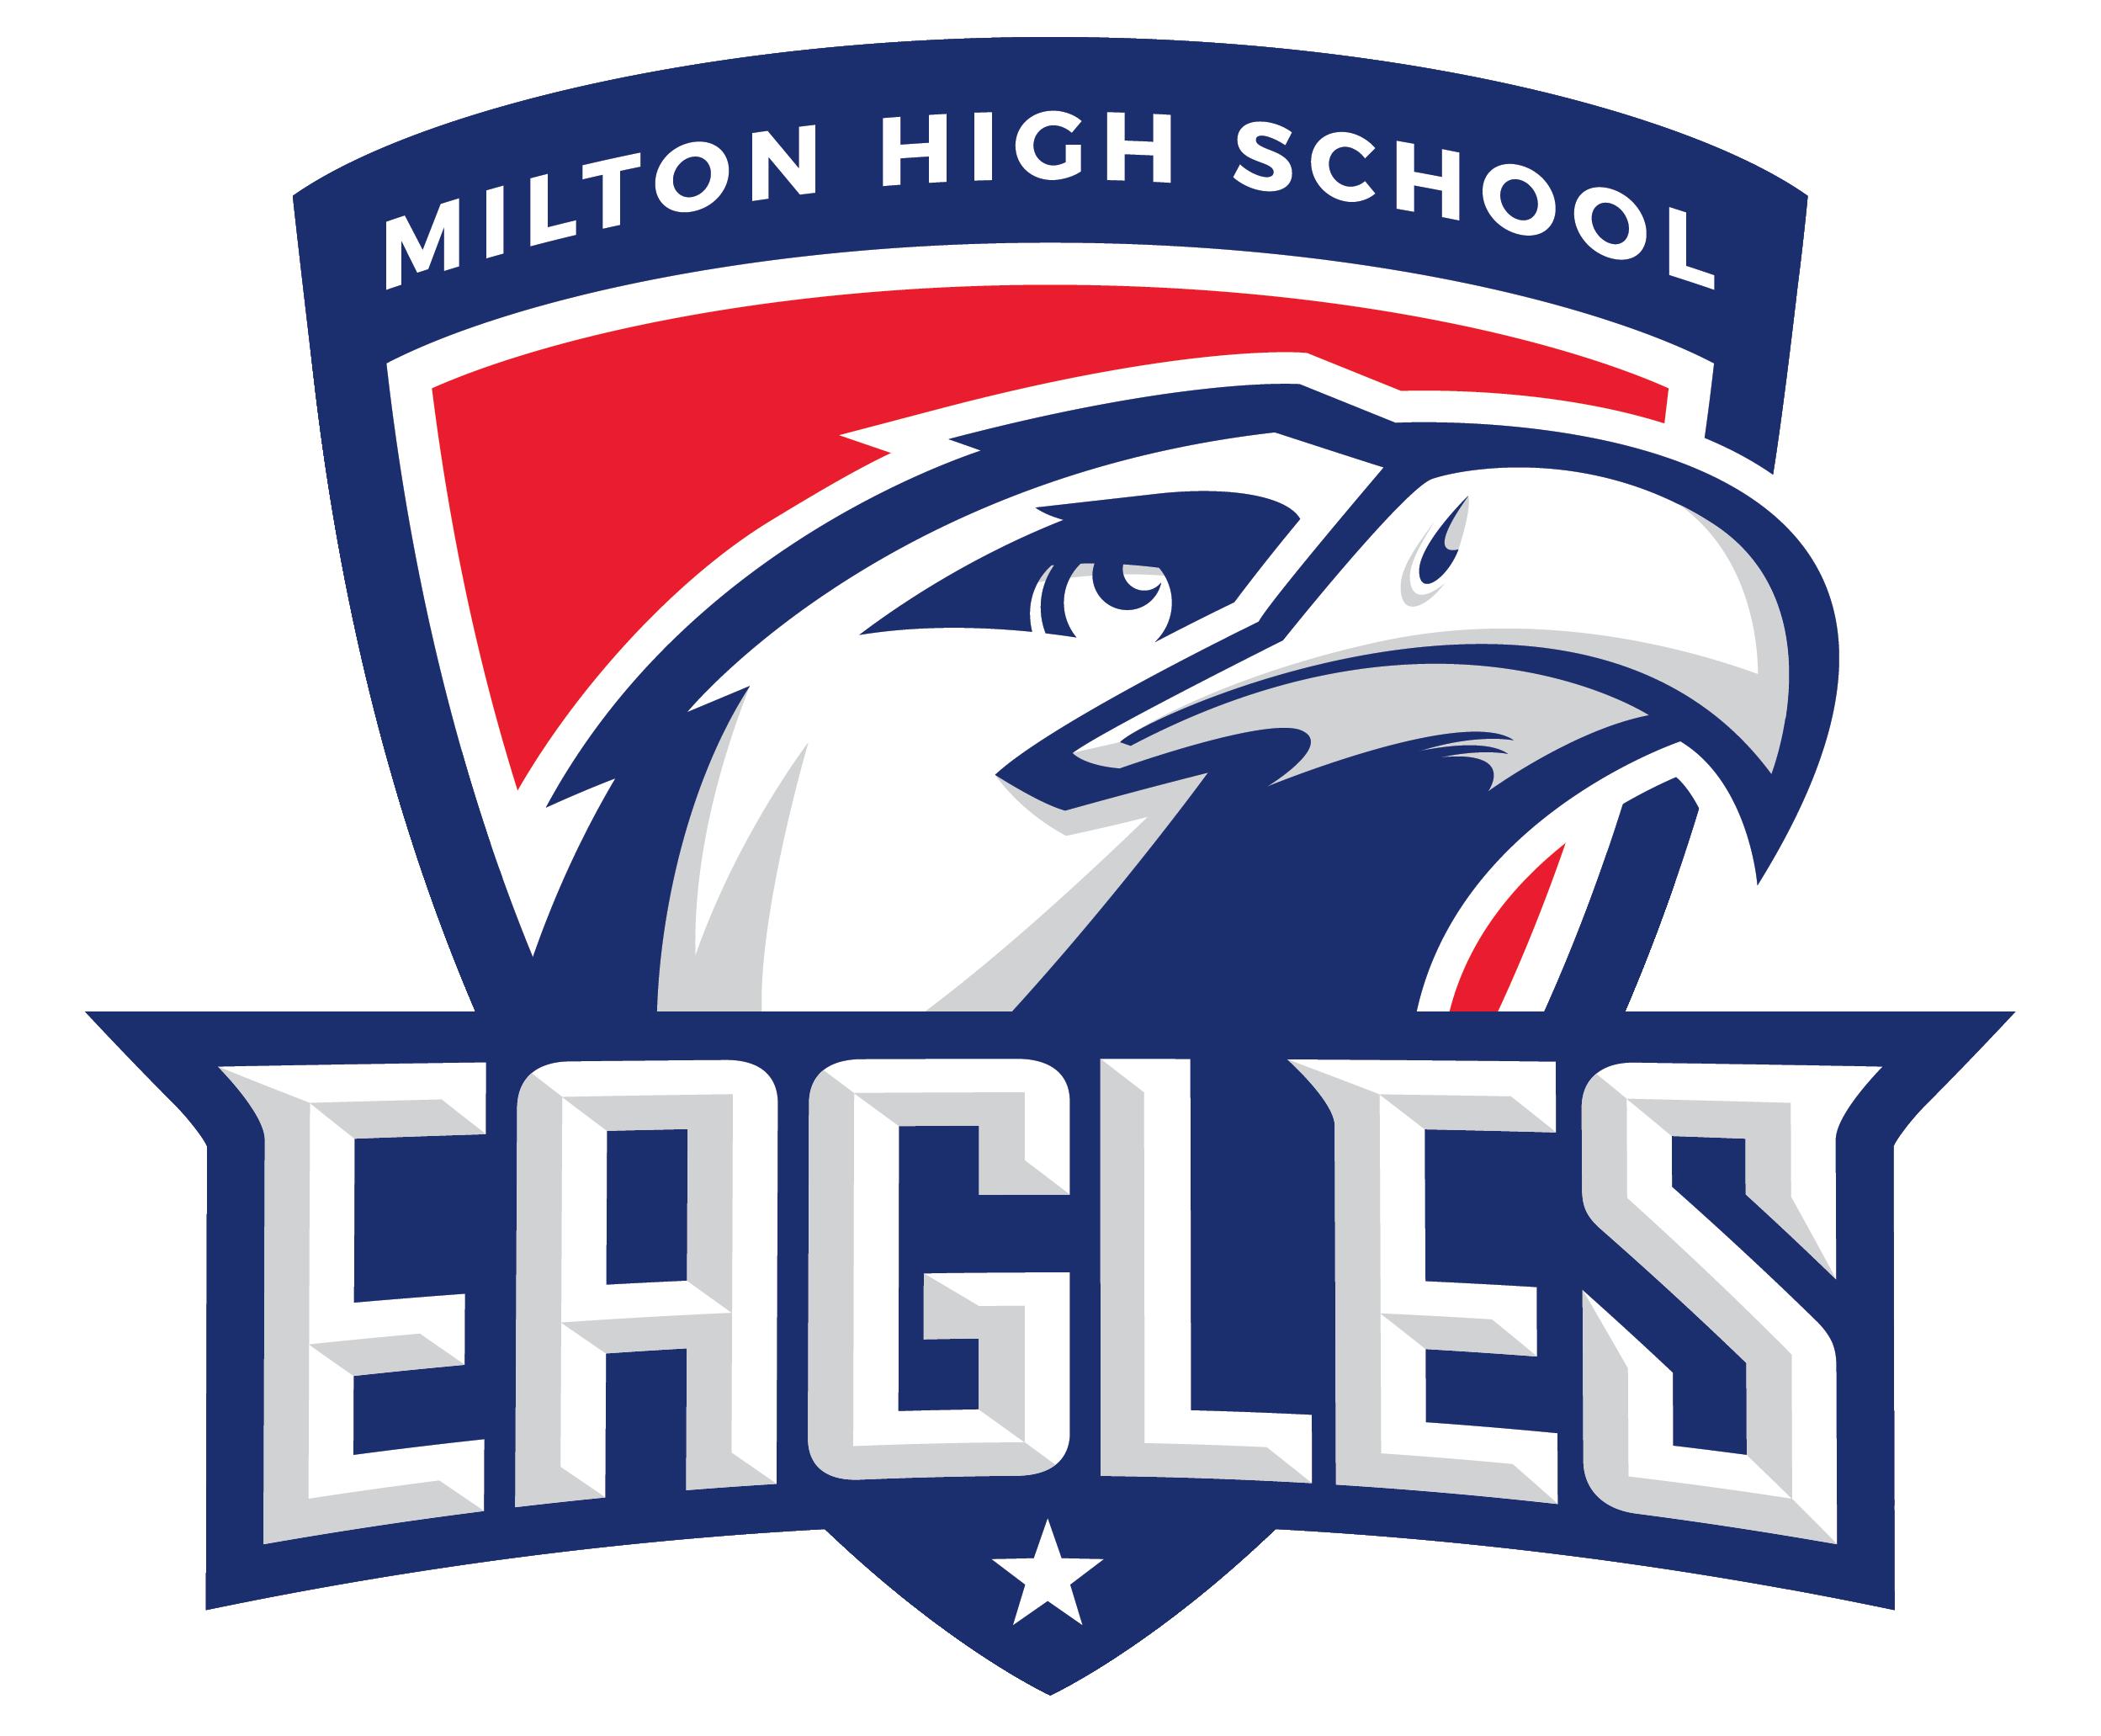 Milton High School.